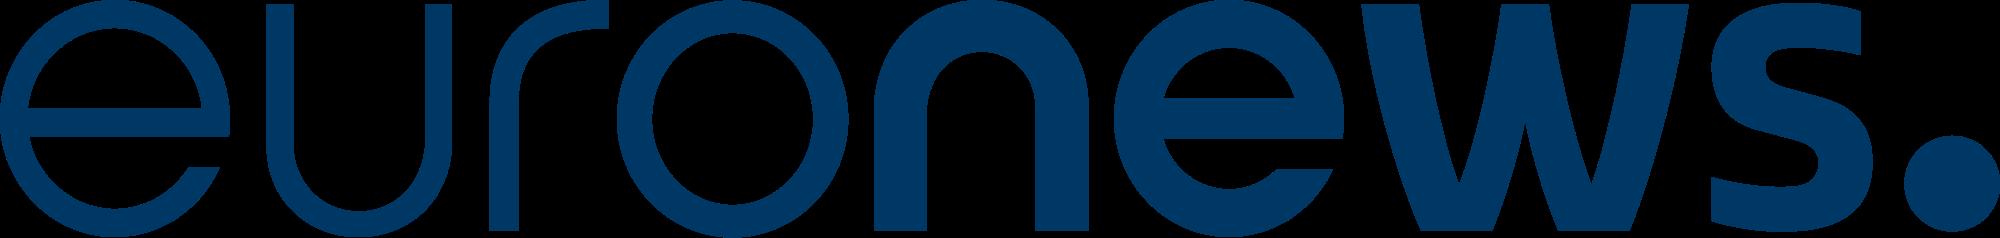 europolitics logo